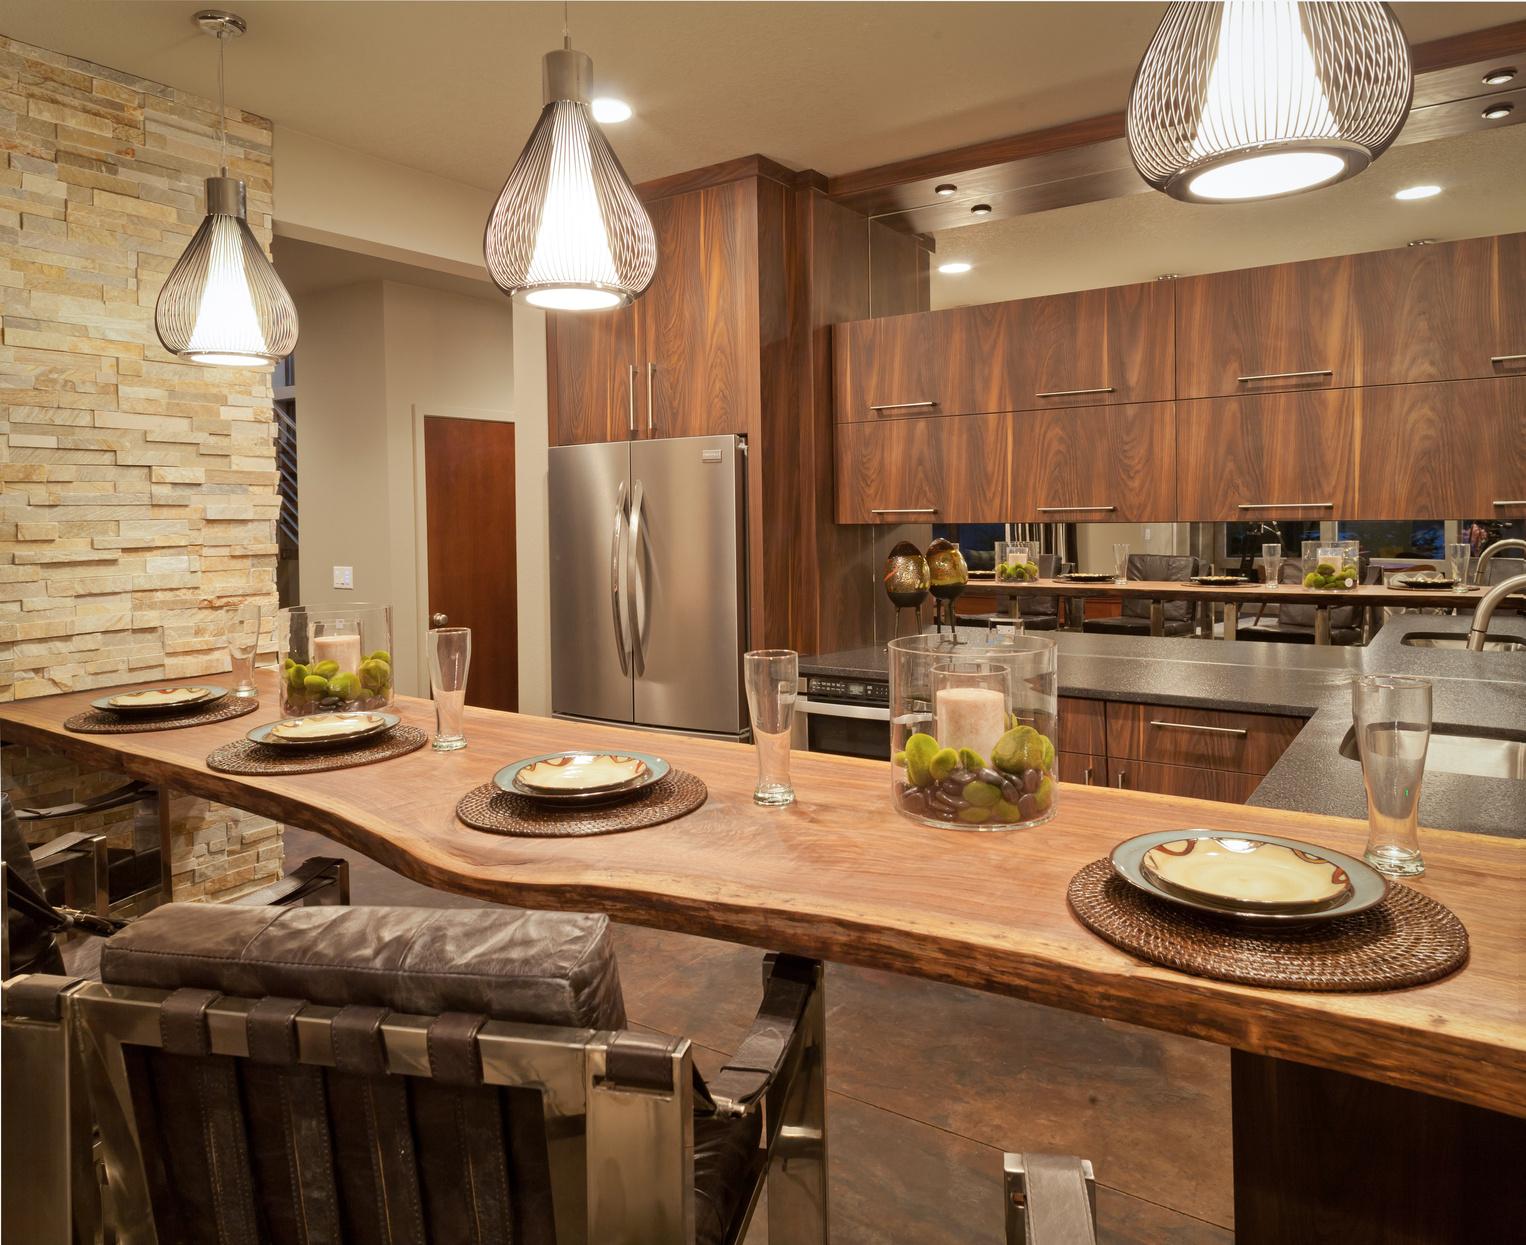 Atemberaubend Kücheninsel Rustikal Galerie - Küche Set Ideen ...